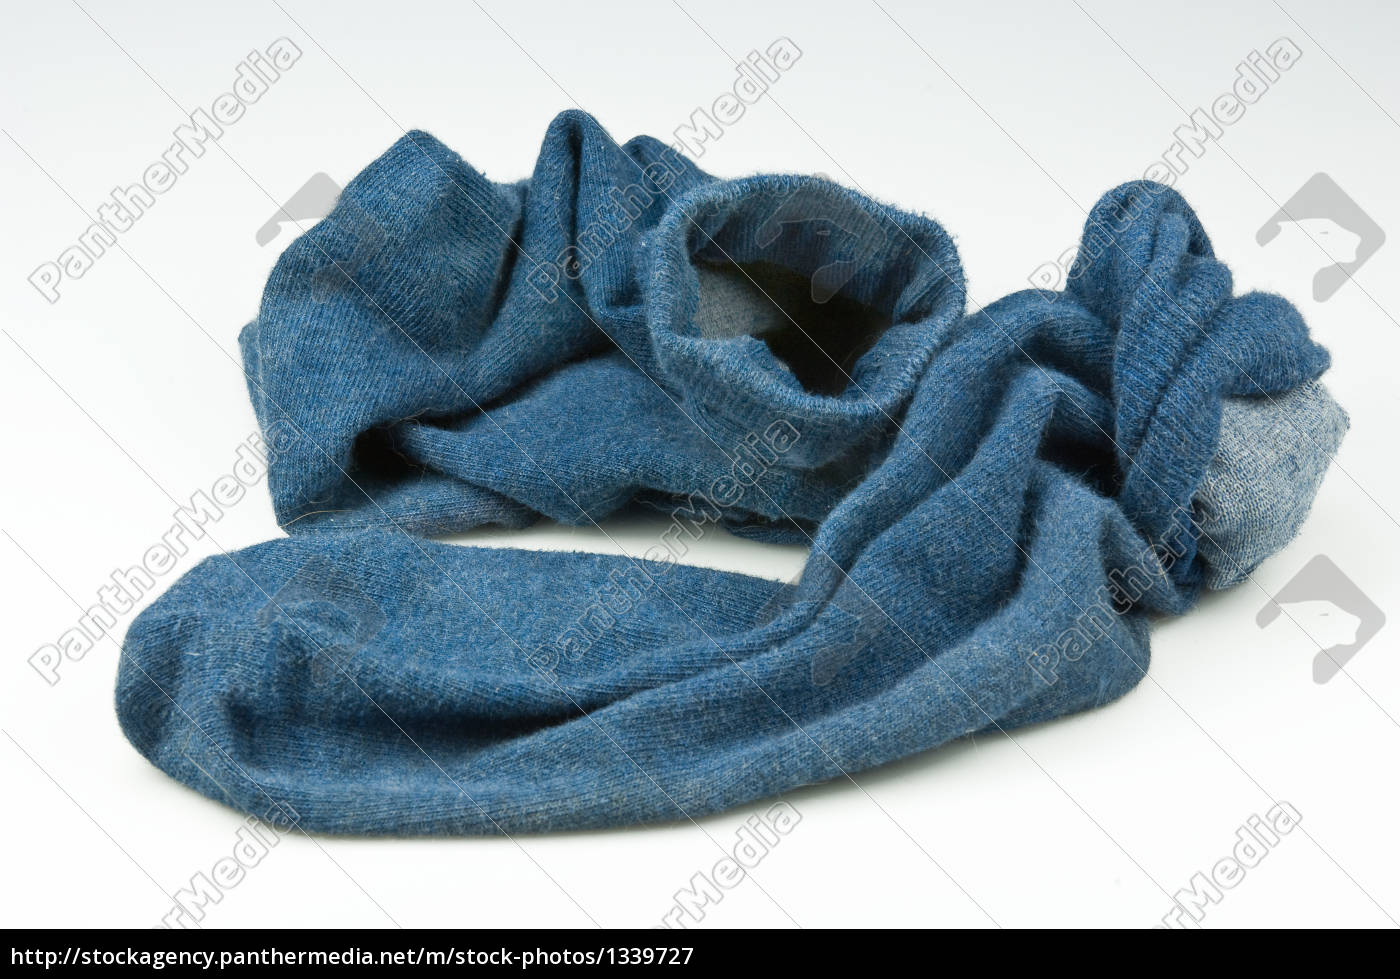 blue, worn, socks - 1339727